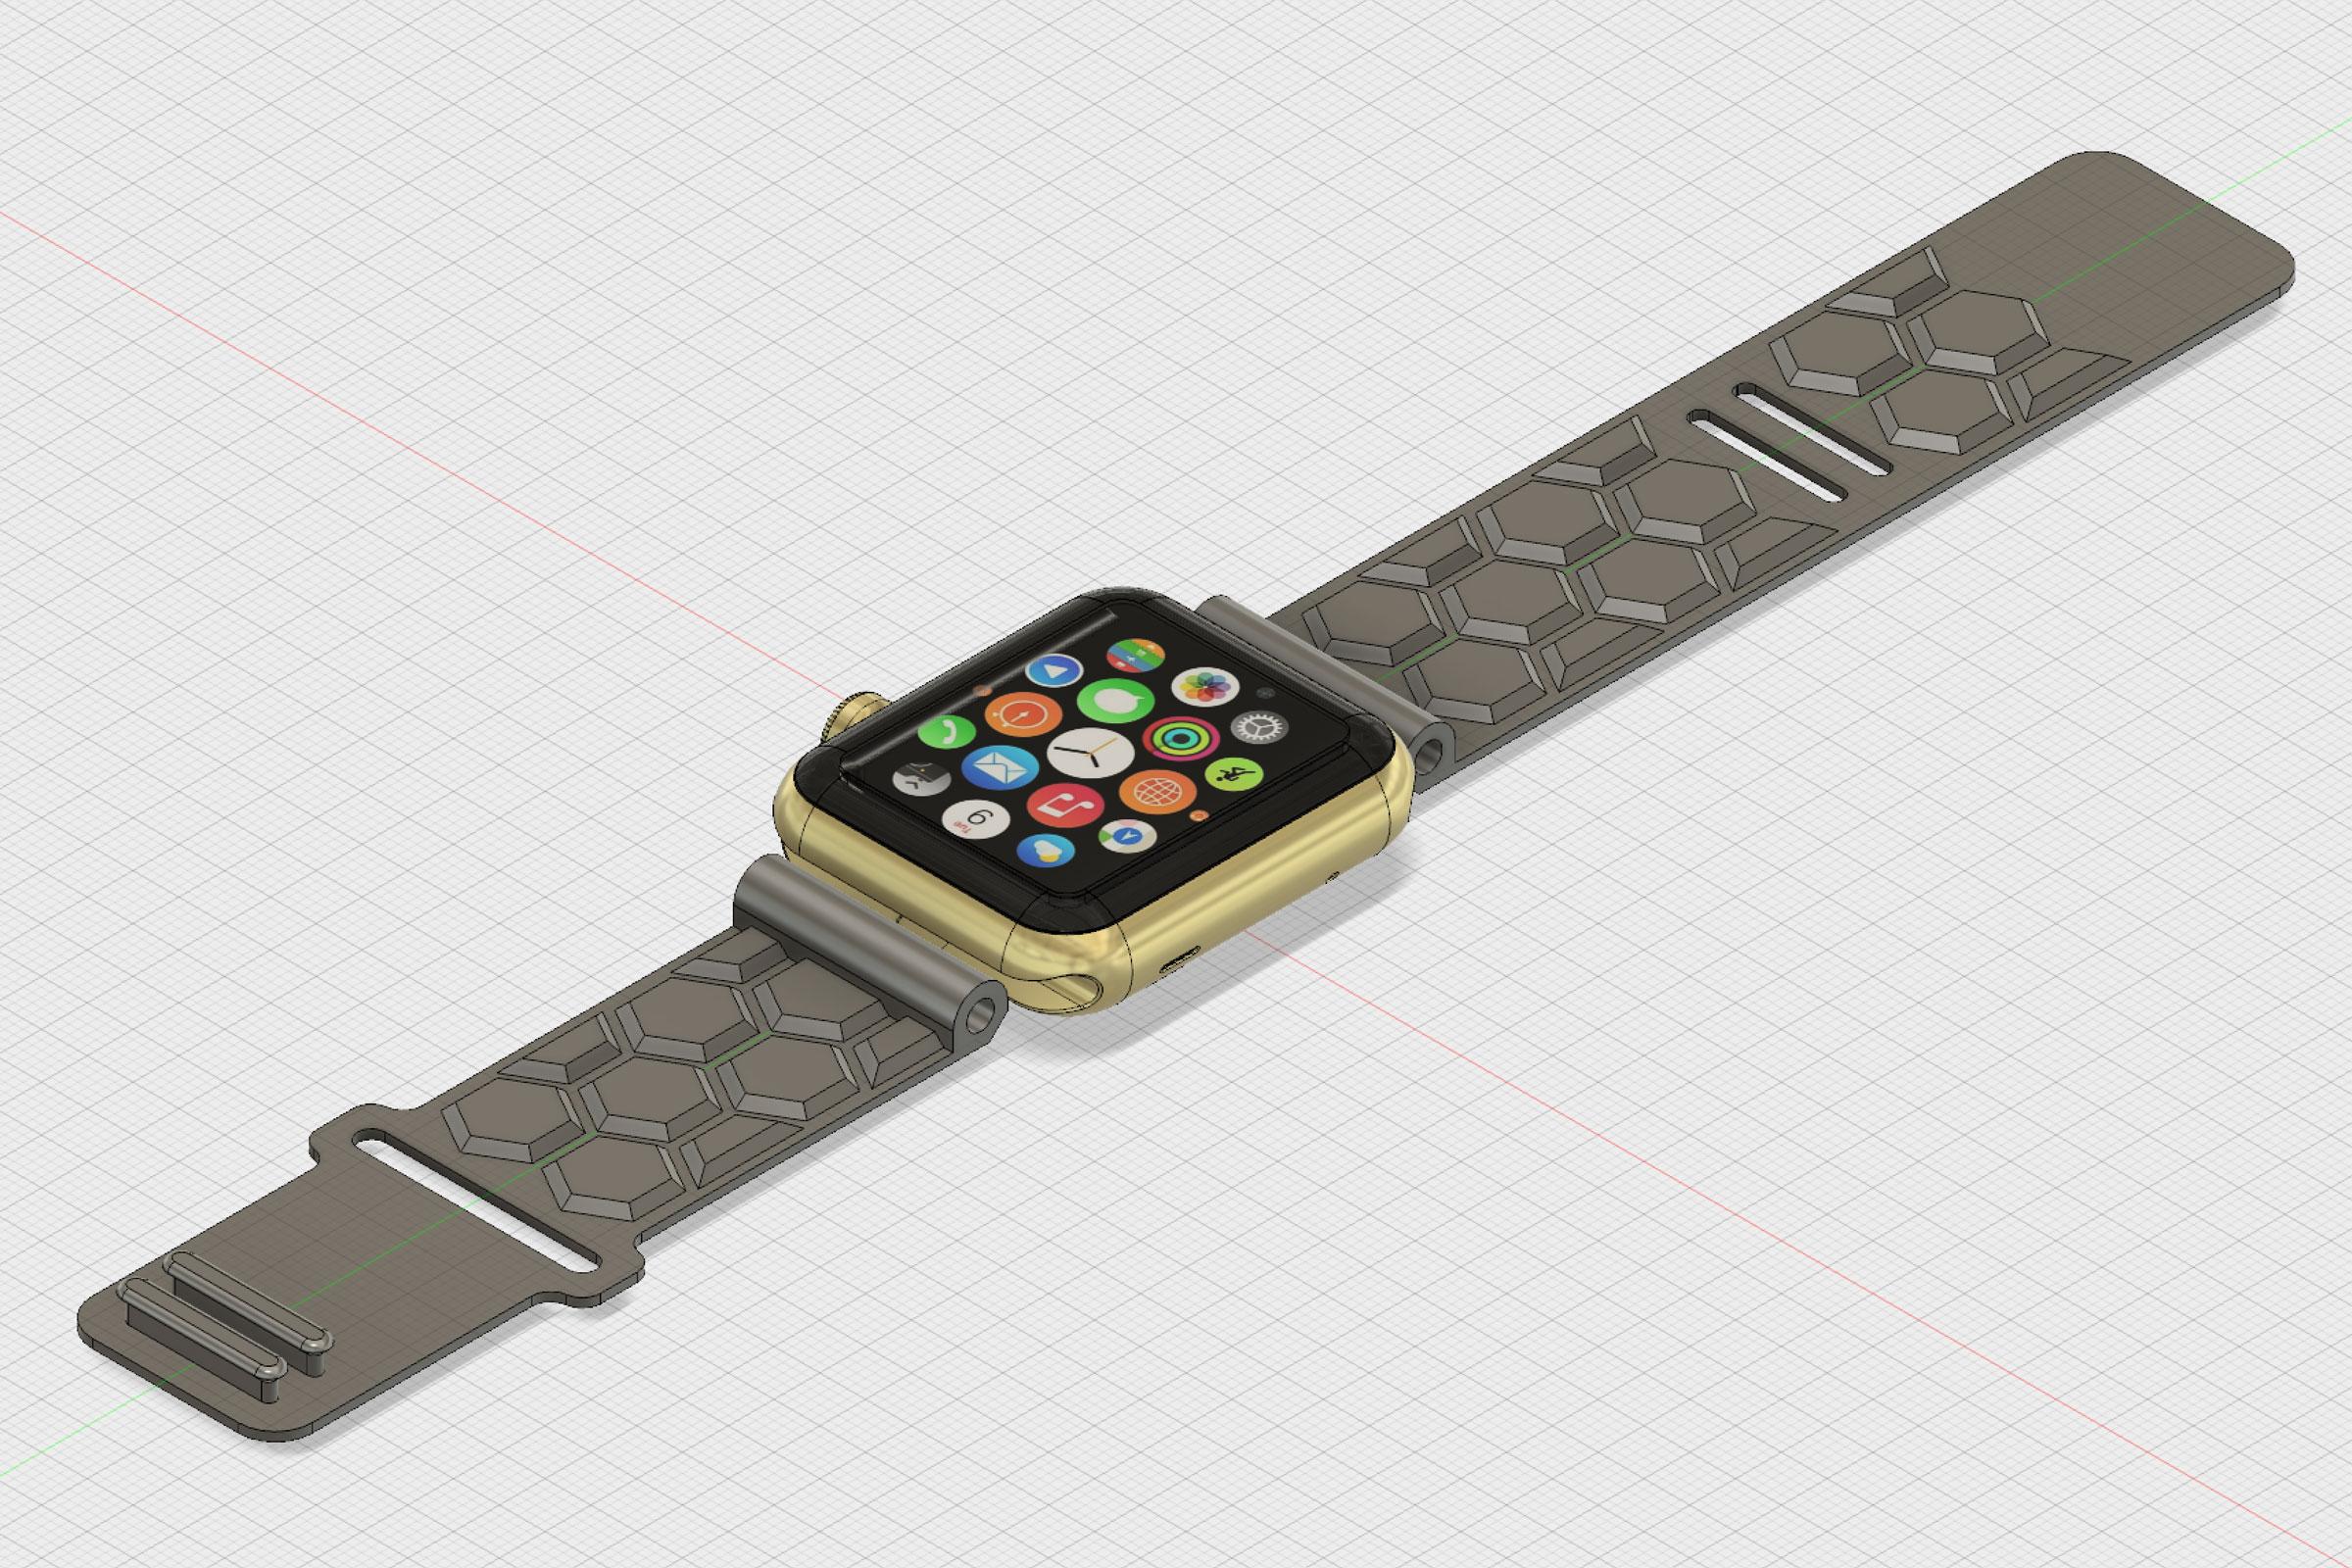 3d_printing_apple-watch-cad-f360.jpg